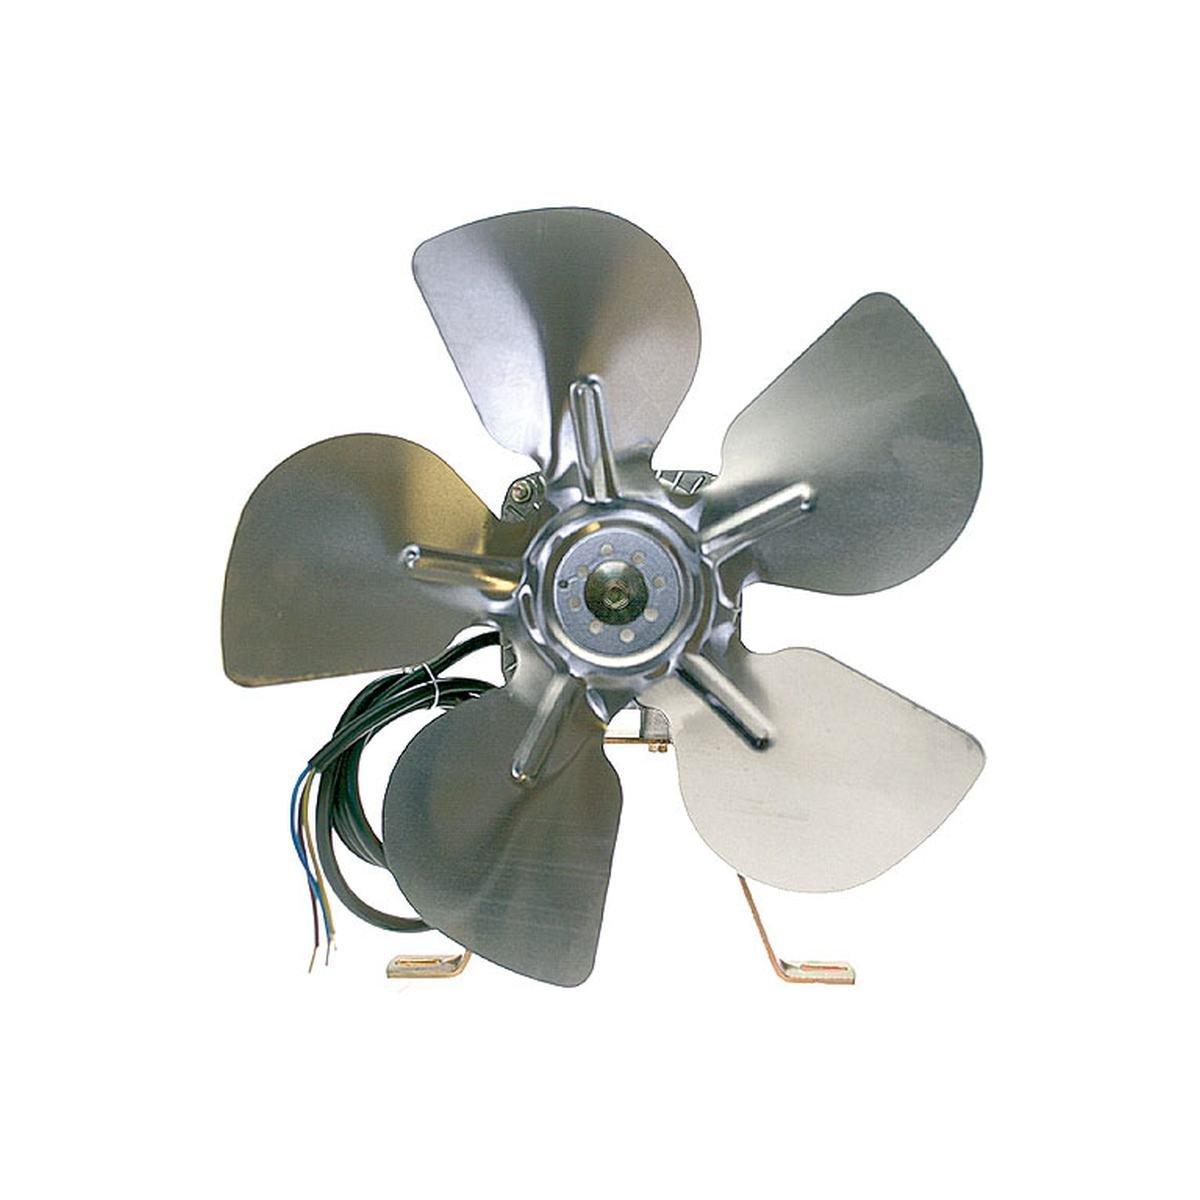 Ventilator 34W med vingediameter 300 mm. - Elco